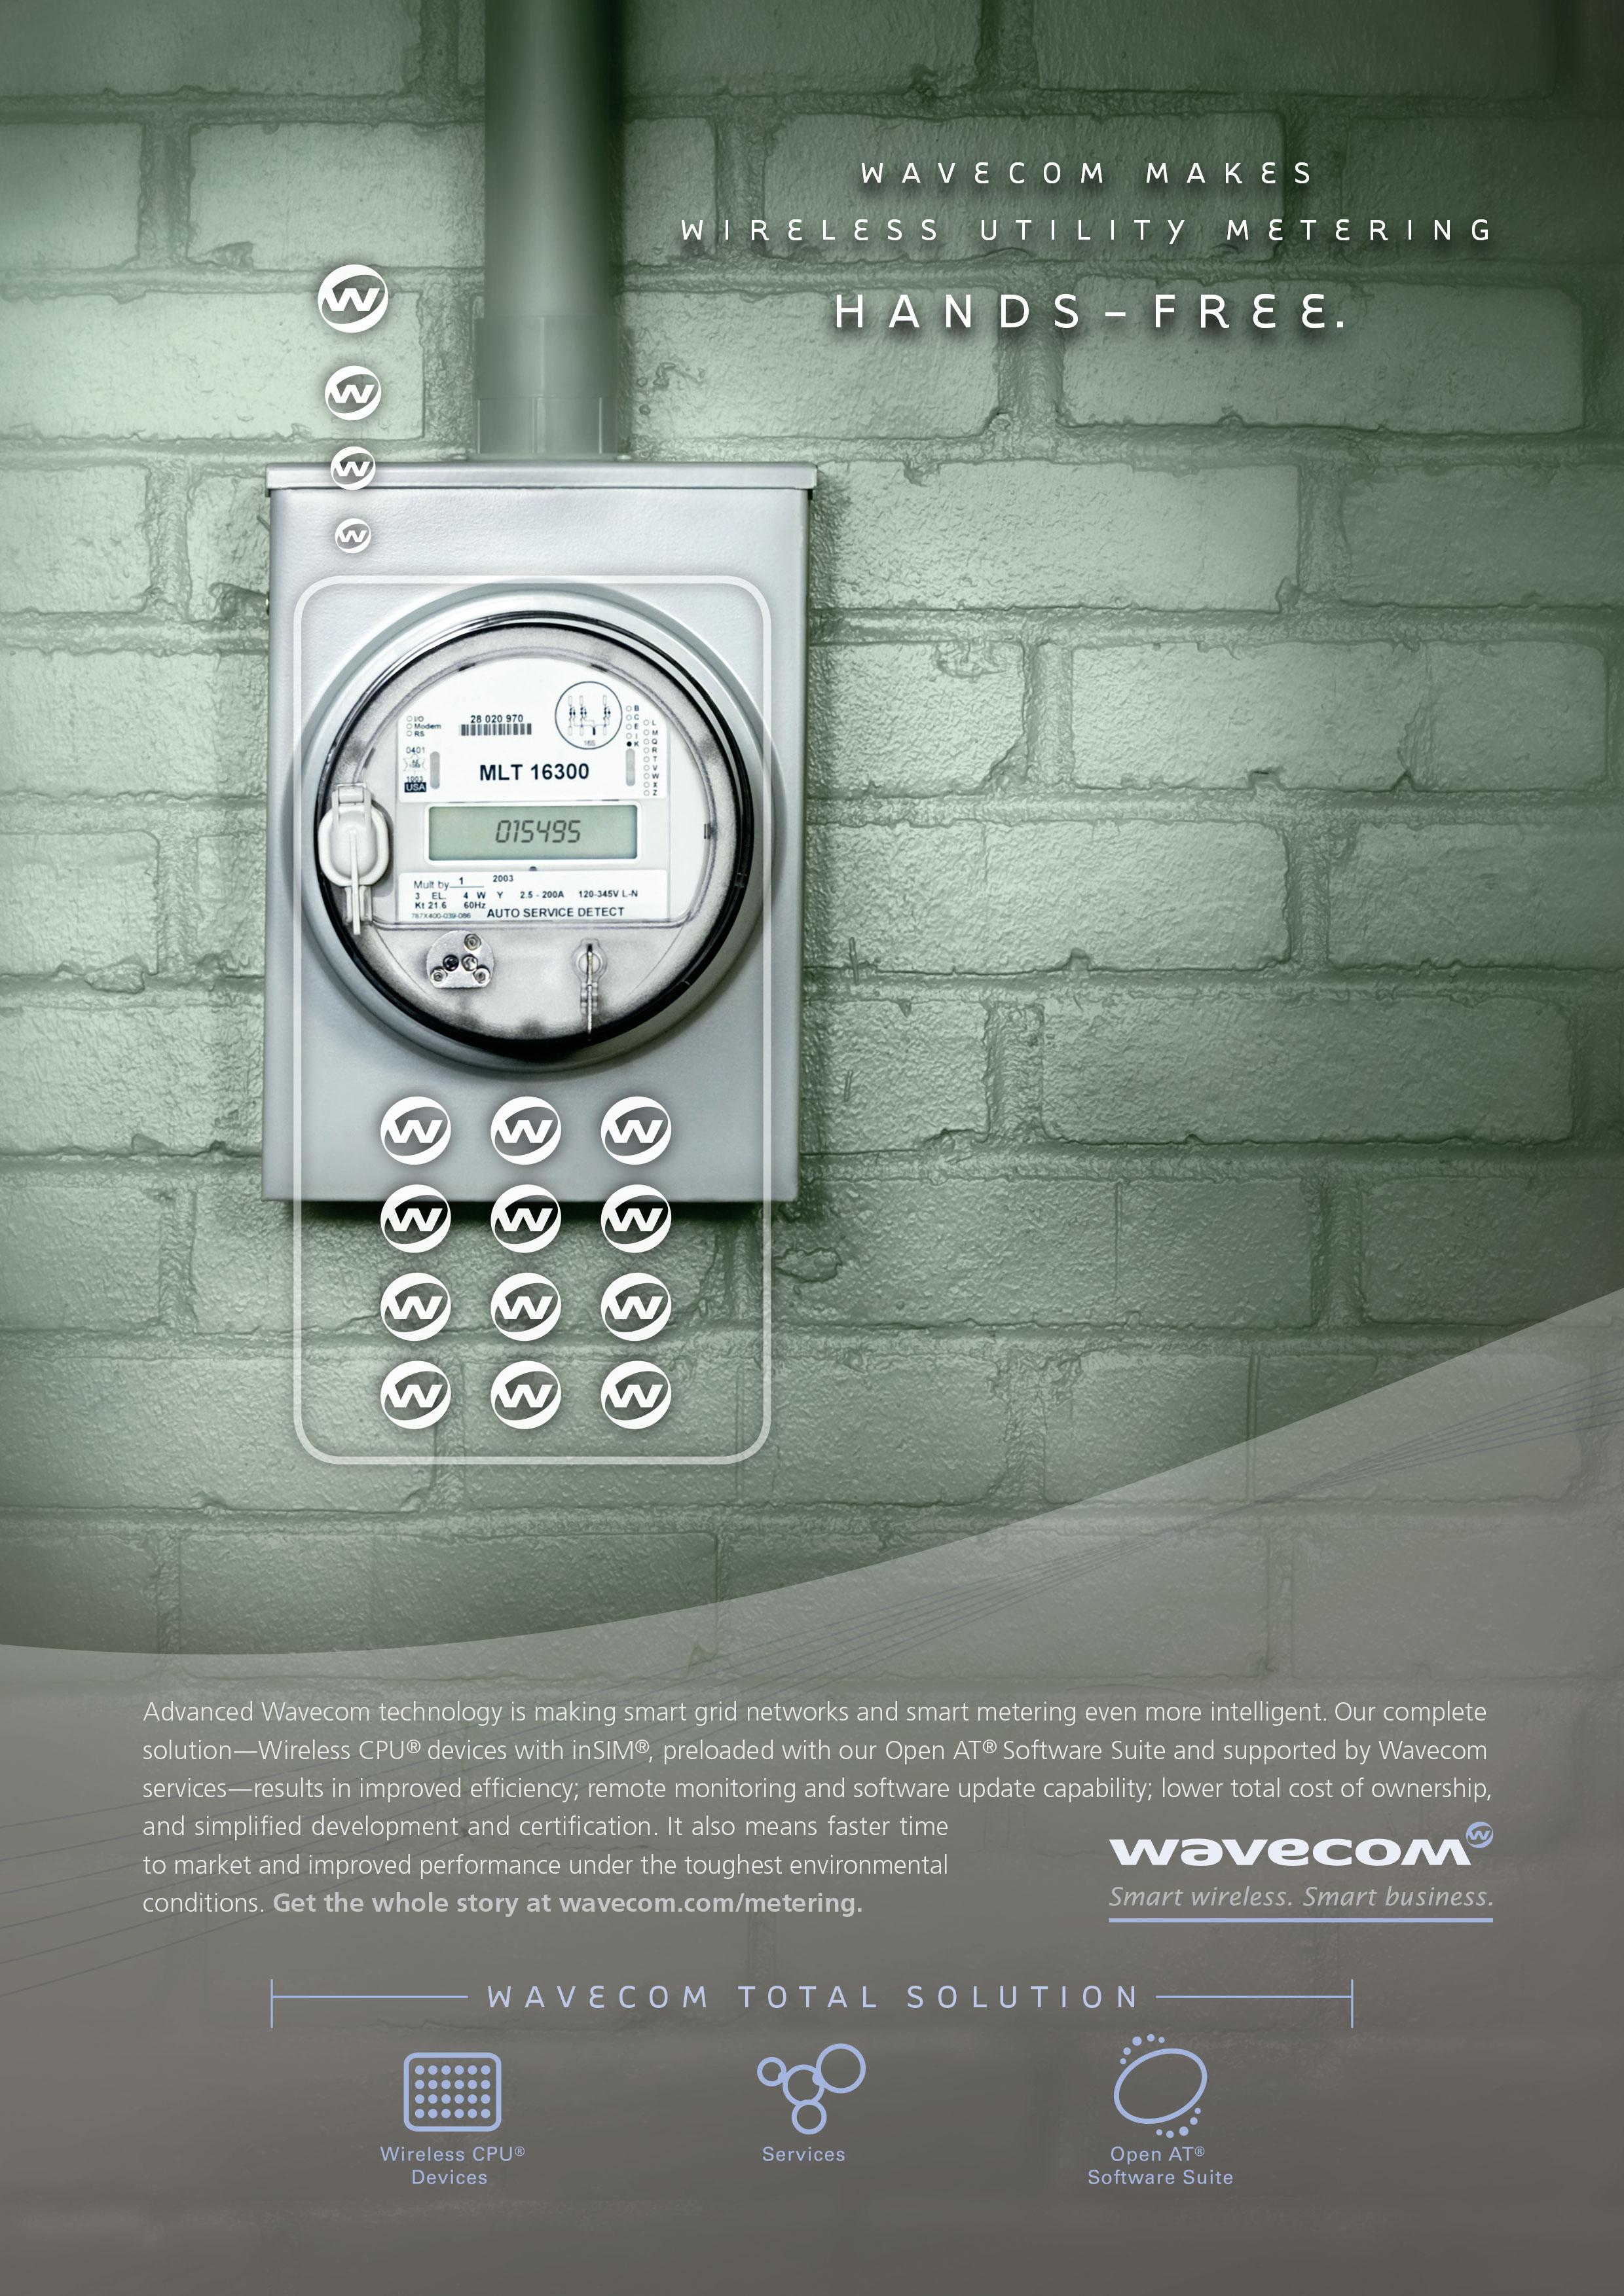 WAVECOM-Metering.jpg